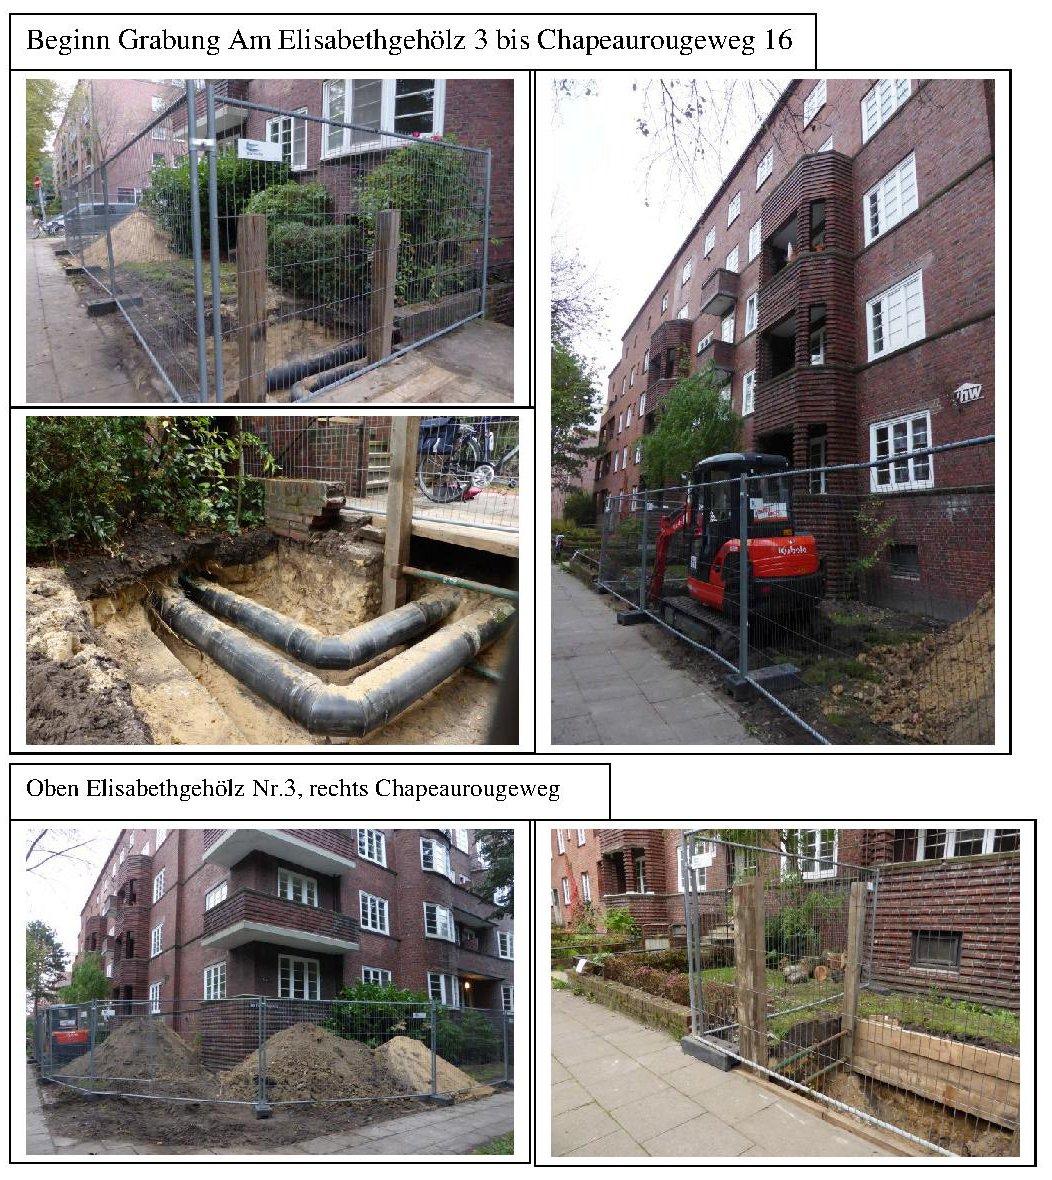 9 Elisabethgehölz 3 - Chapeaurougeweg 16